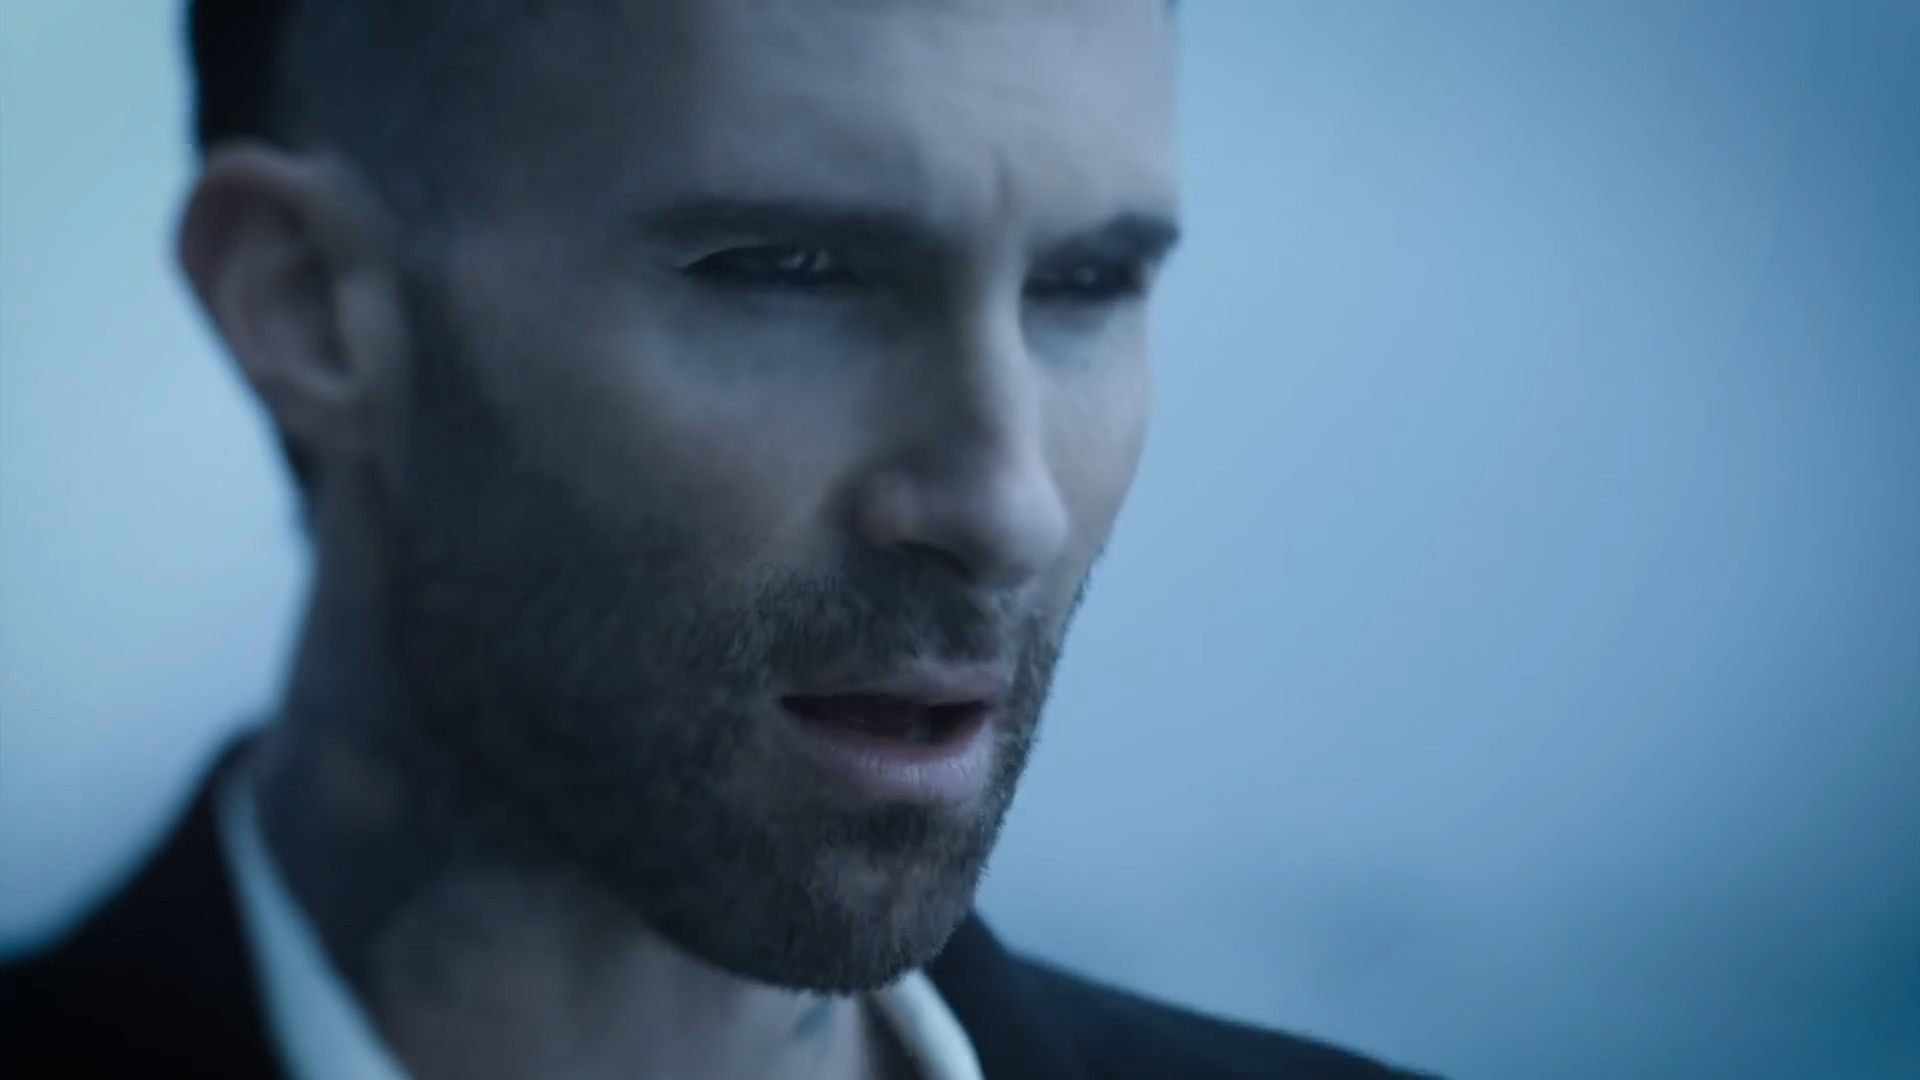 Lost - Maroon 5